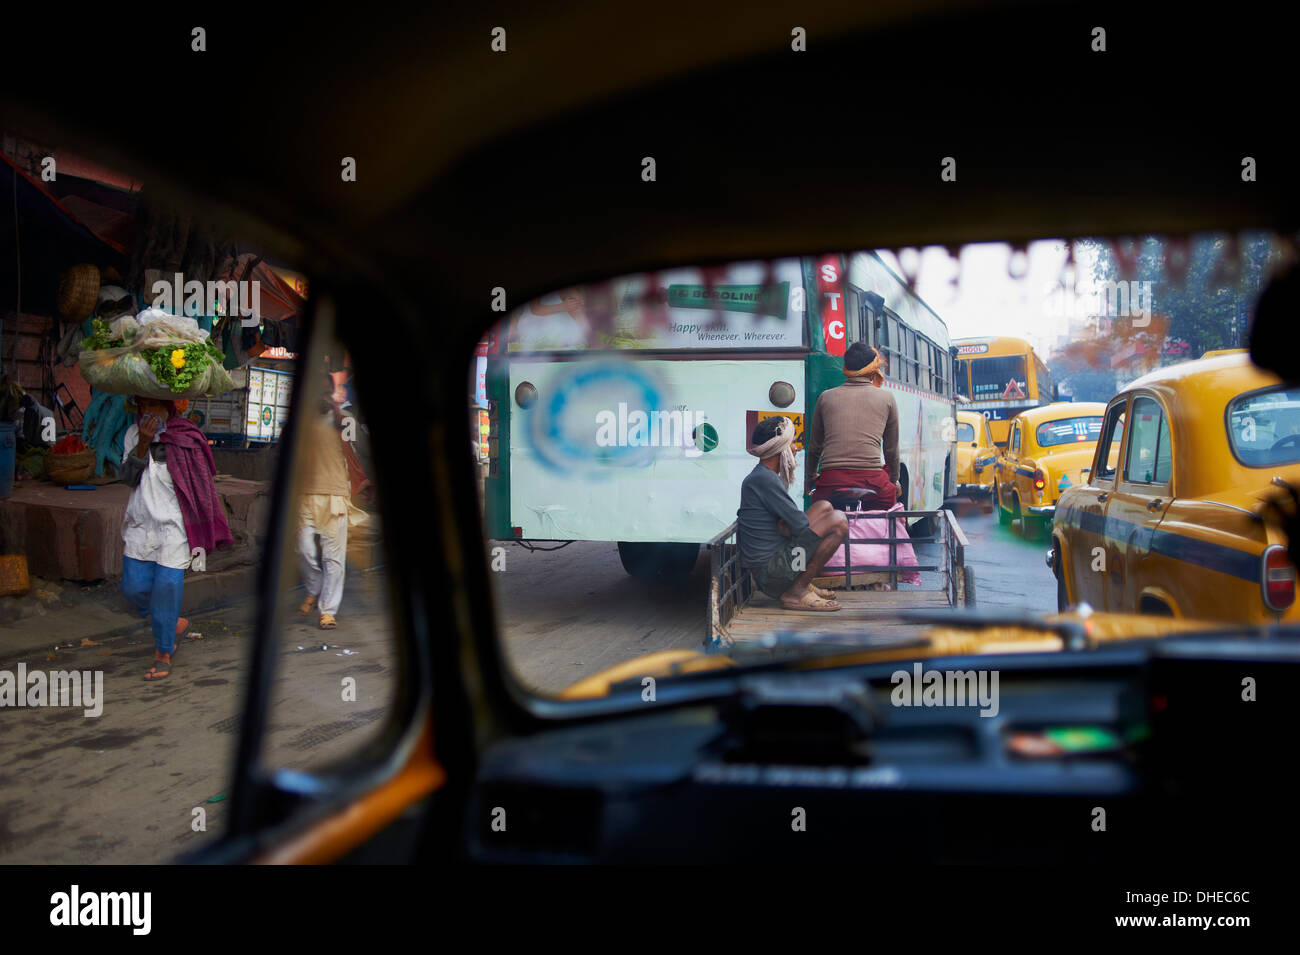 Yellow Ambassador taxis, Kolkata (Calcutta), West Bengal, India, Asia - Stock Image